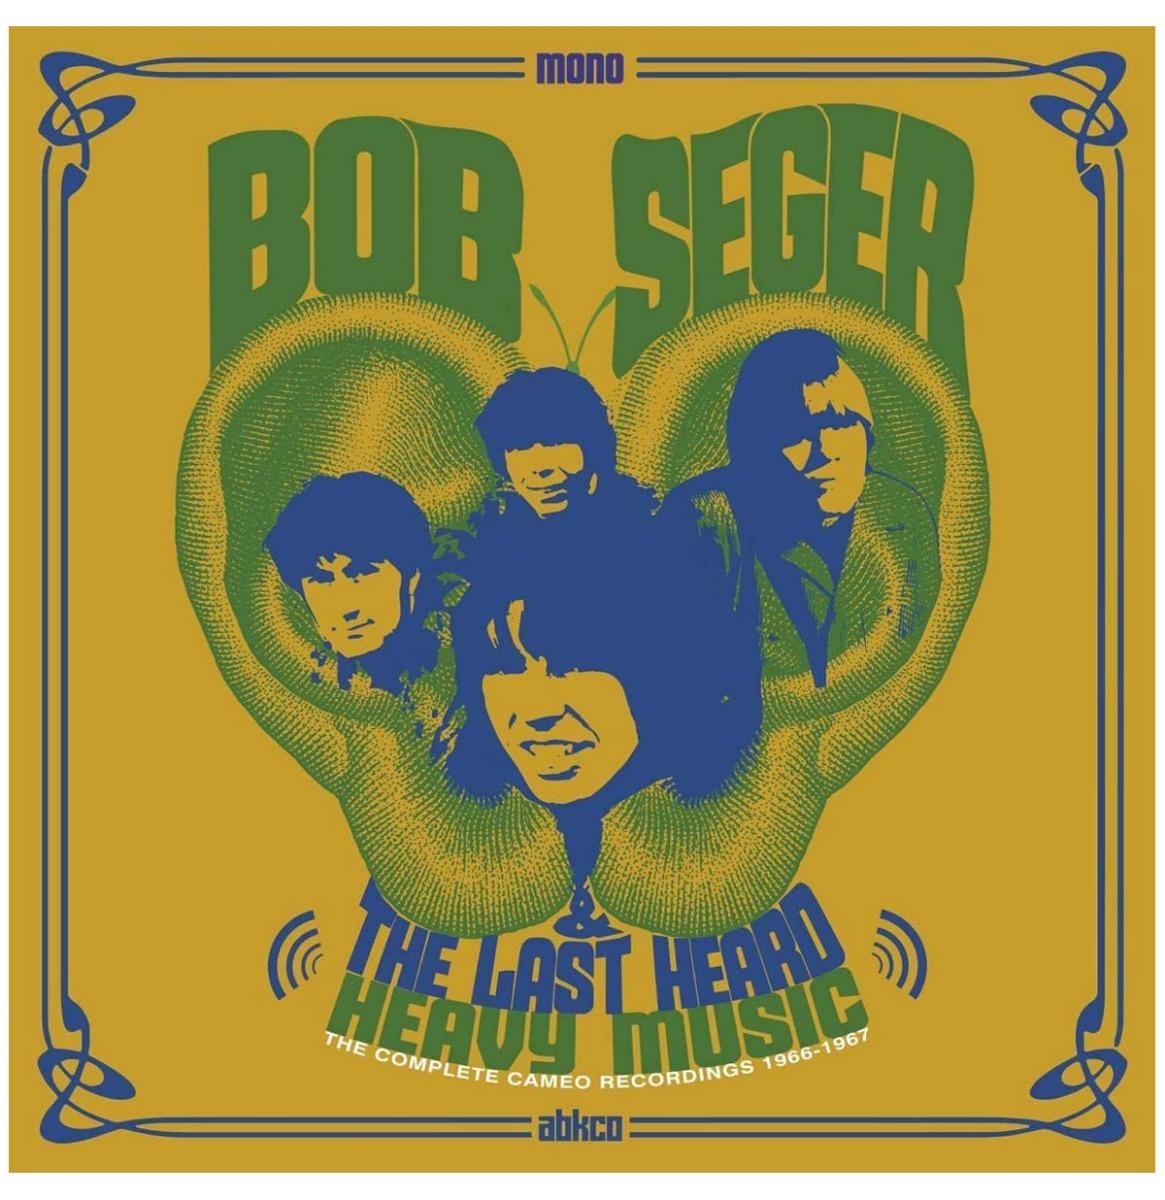 Bob Seger - Heavy Music The Complete Cameo Recordings 1966-1967 LP